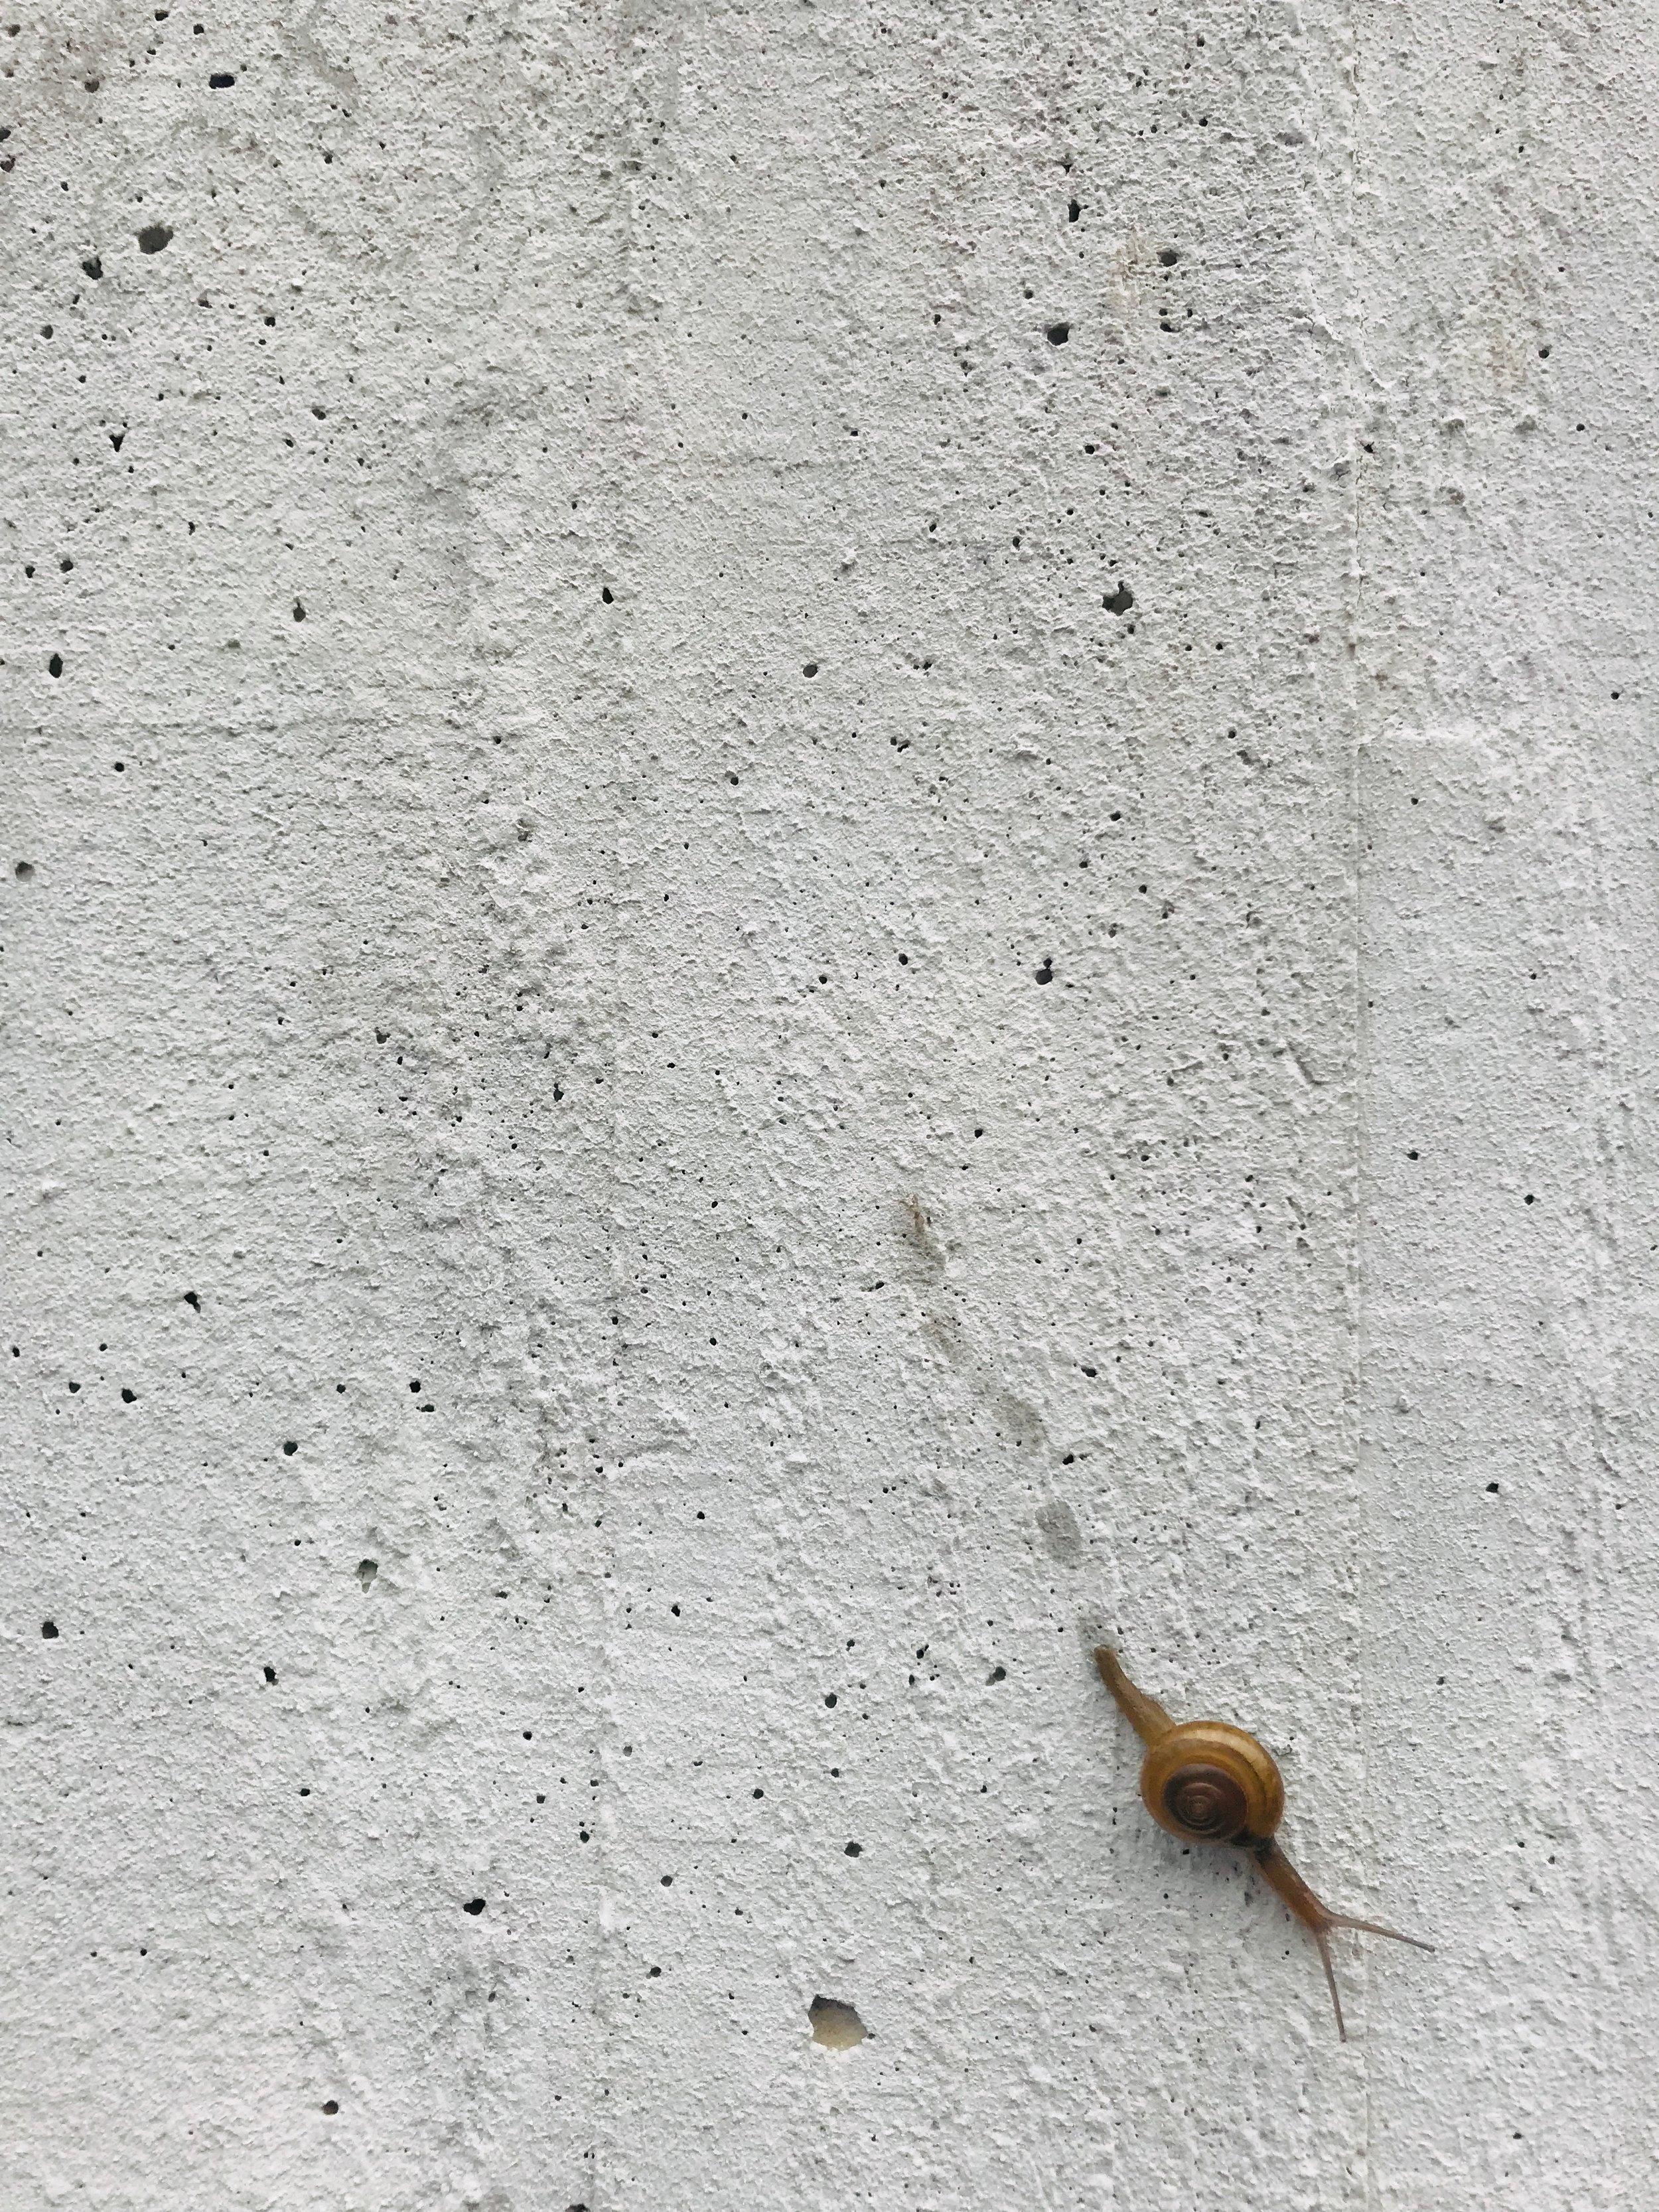 gena-okami-1661660-unsplash.jpg